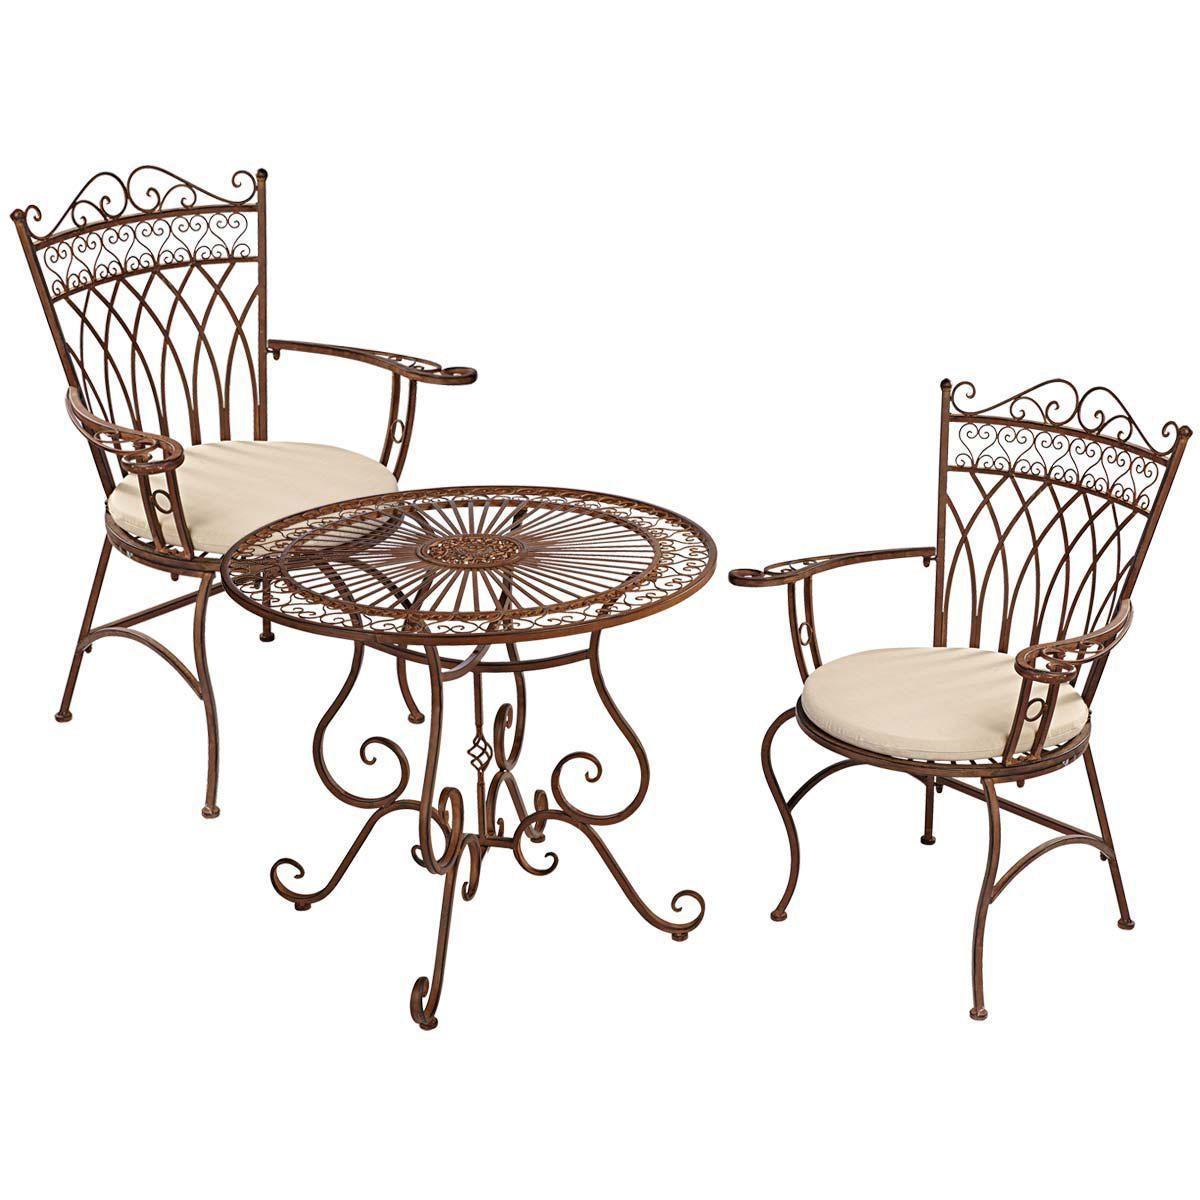 Gartenmöbel-Set, 3-tlg. Versailles Jetzt bestellen unter: https ...